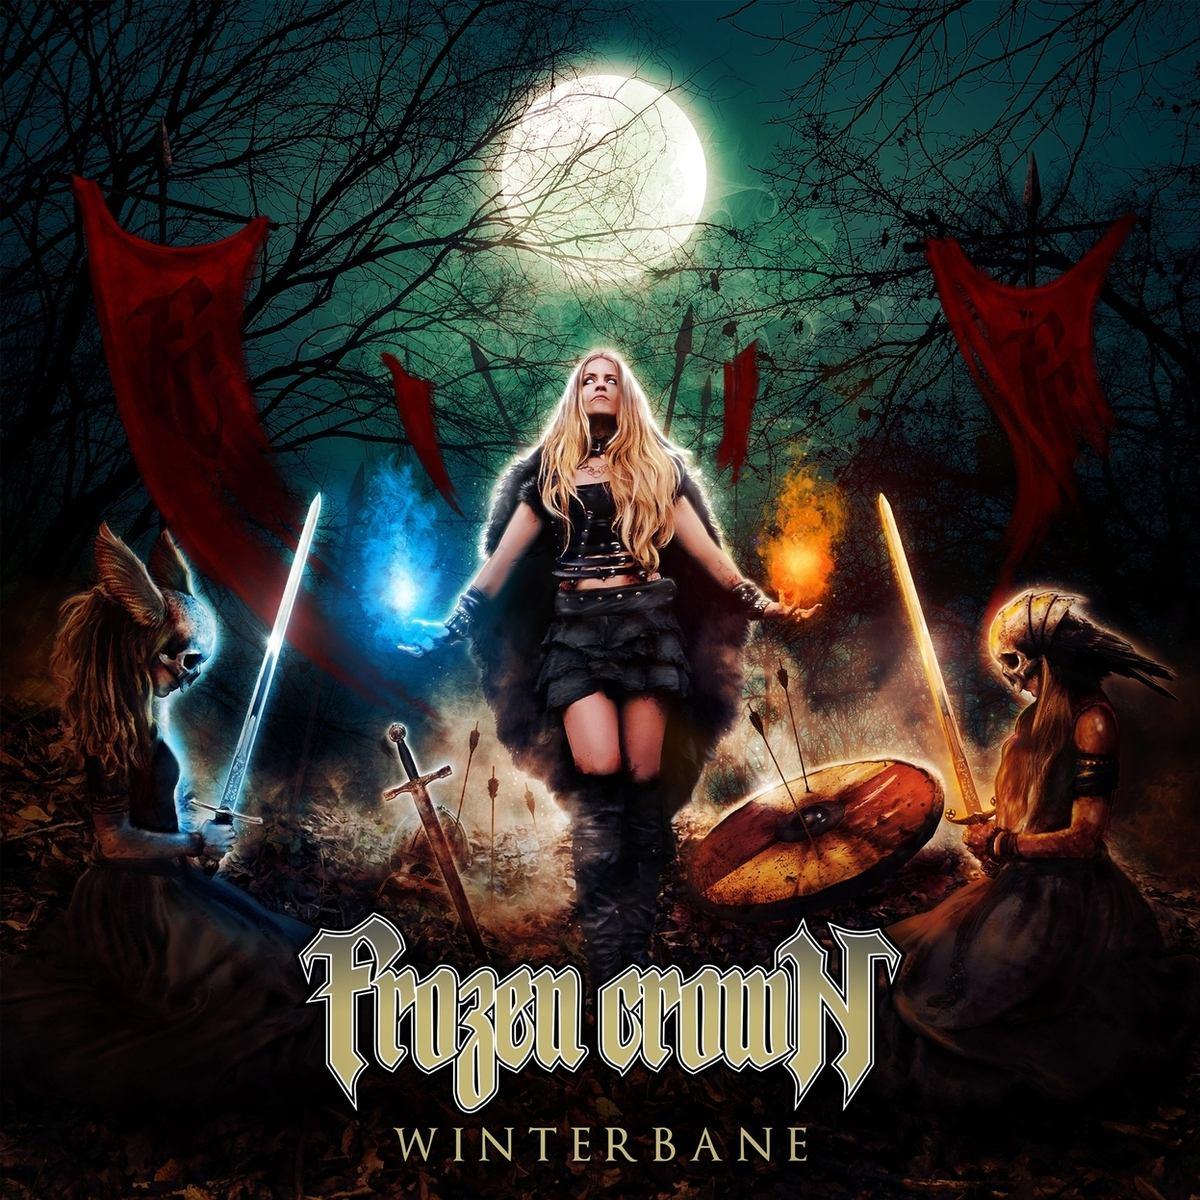 Frozen Crown Winterbane Album Cover